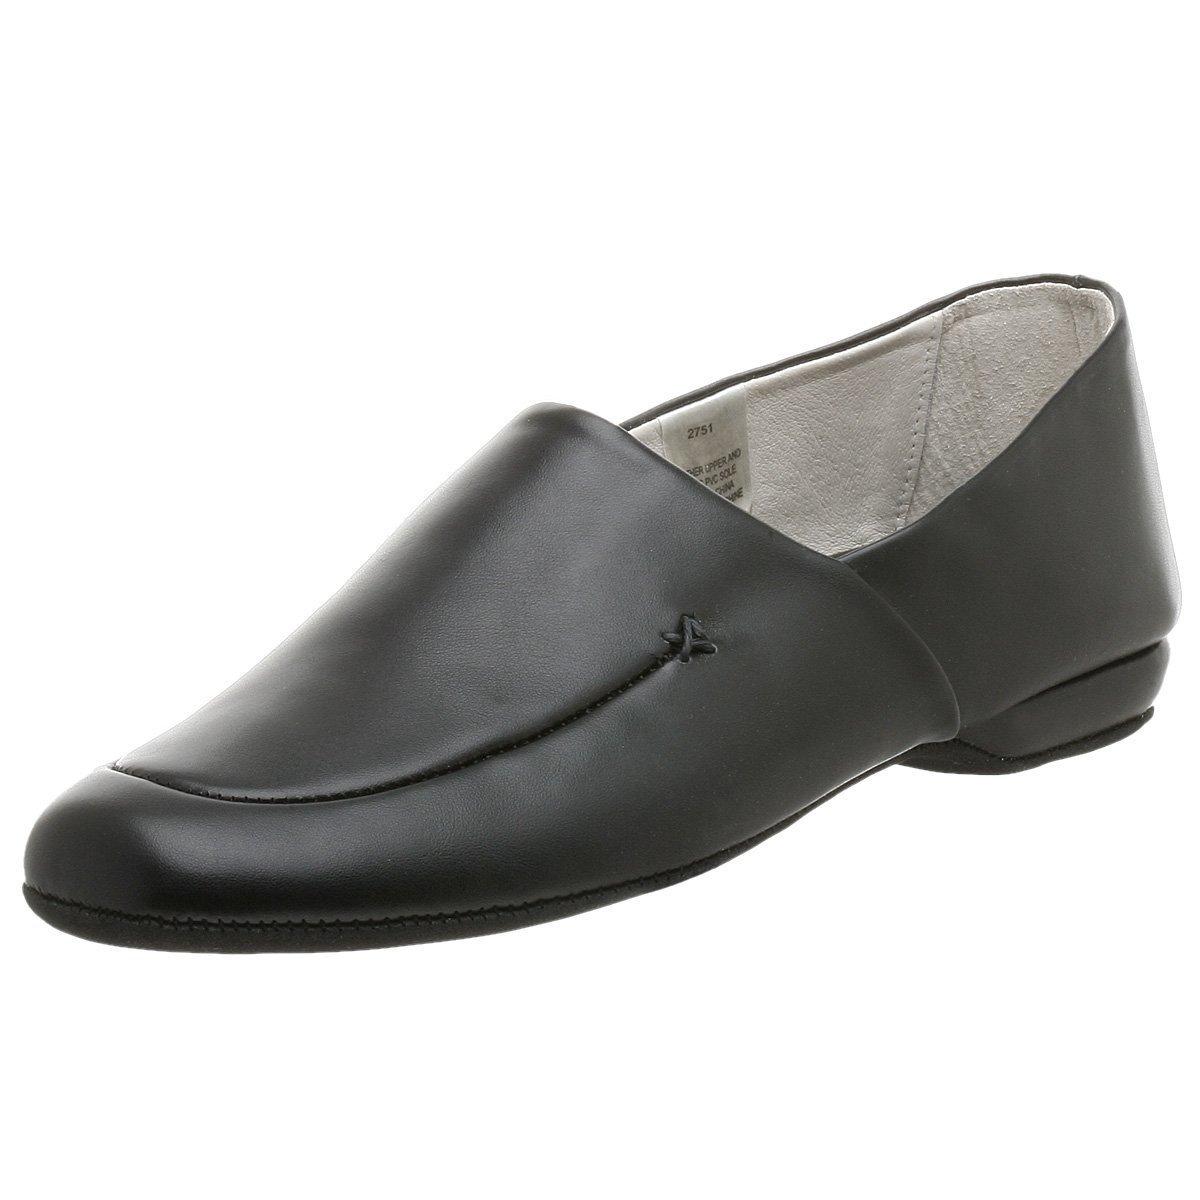 46af6b56b26 L.B. Evans Duke Opera  Amazon.ca  Shoes   Handbags